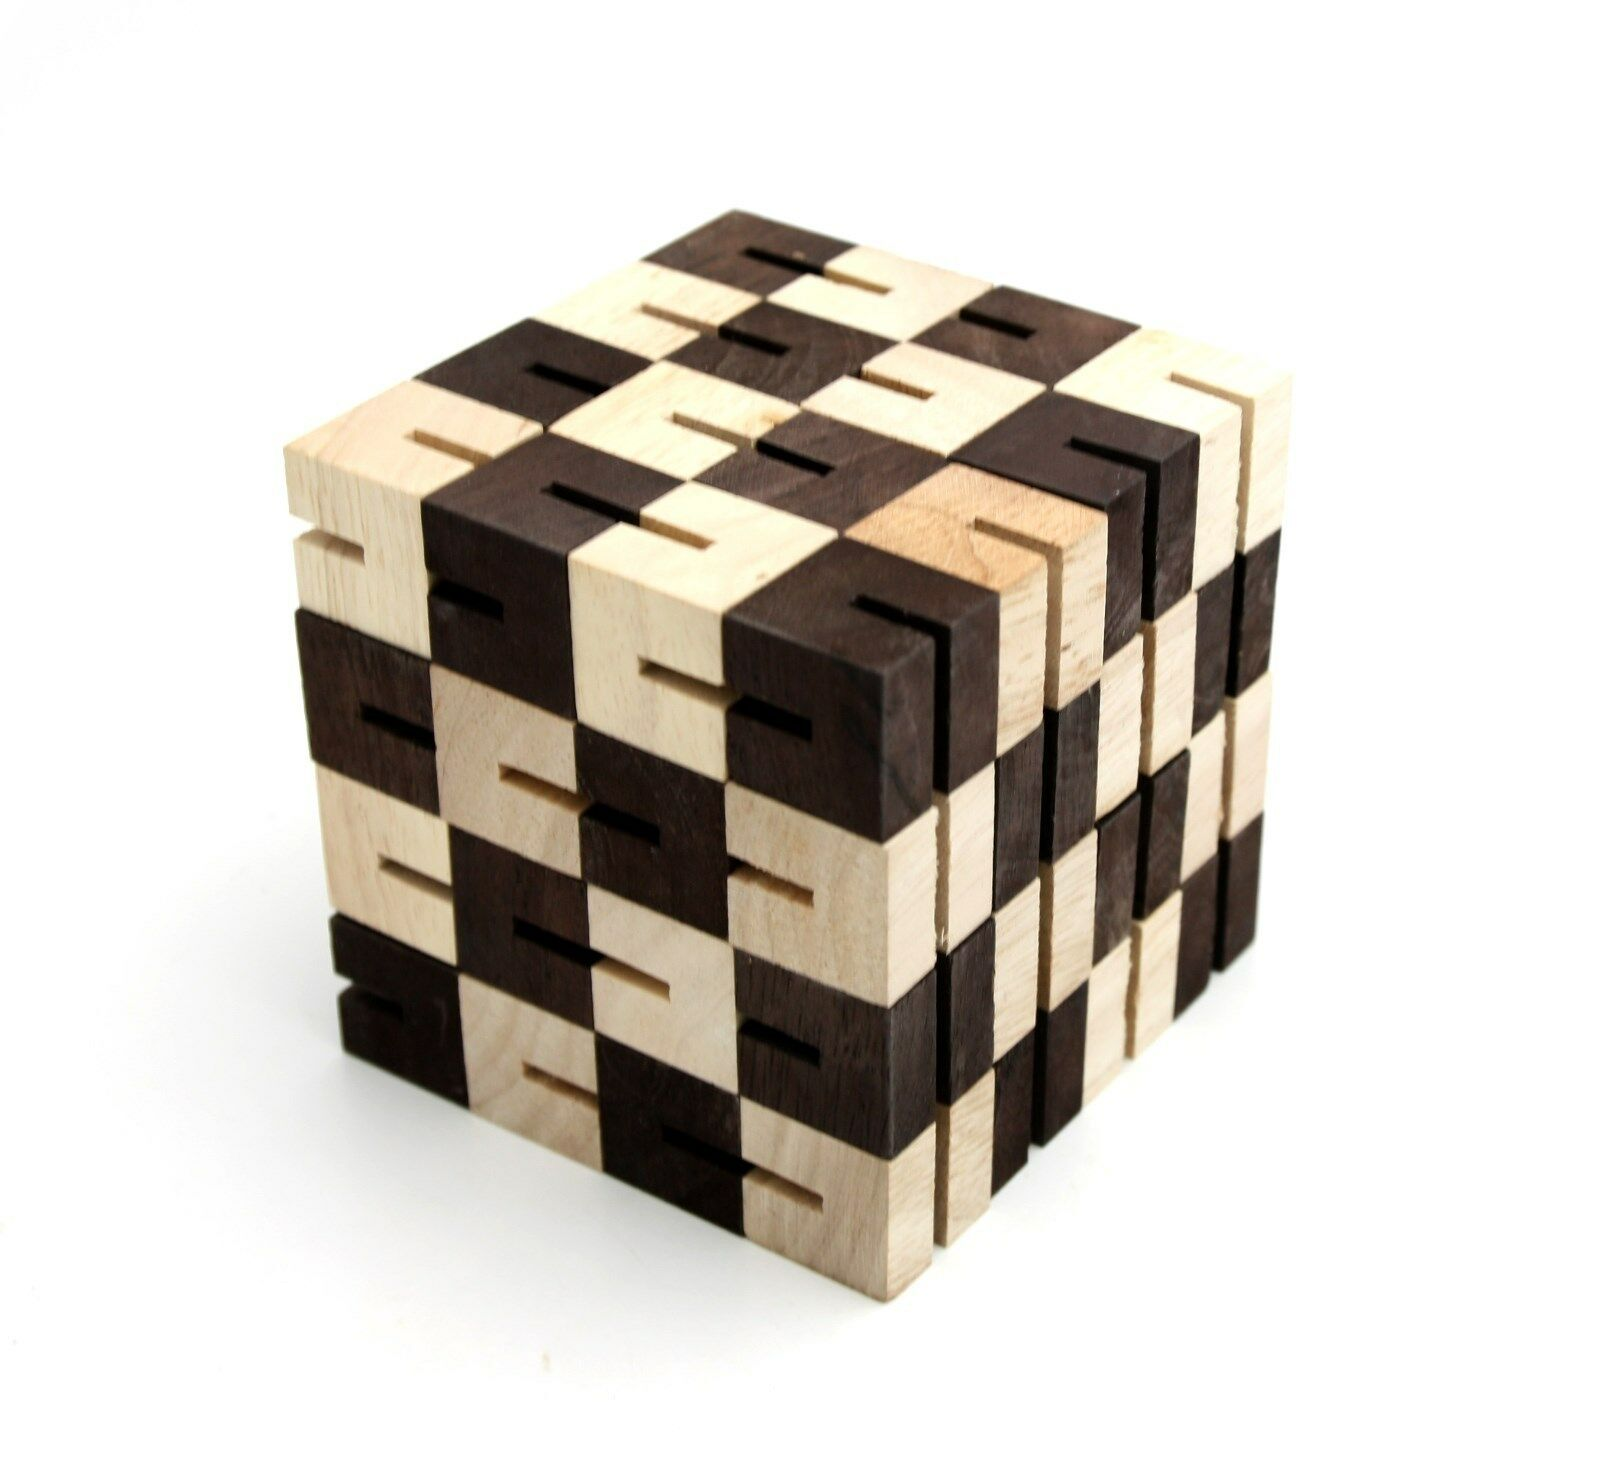 5+1  total 6 wooden puzzles Wooden 3D Logic Brain Teaser Puzzle